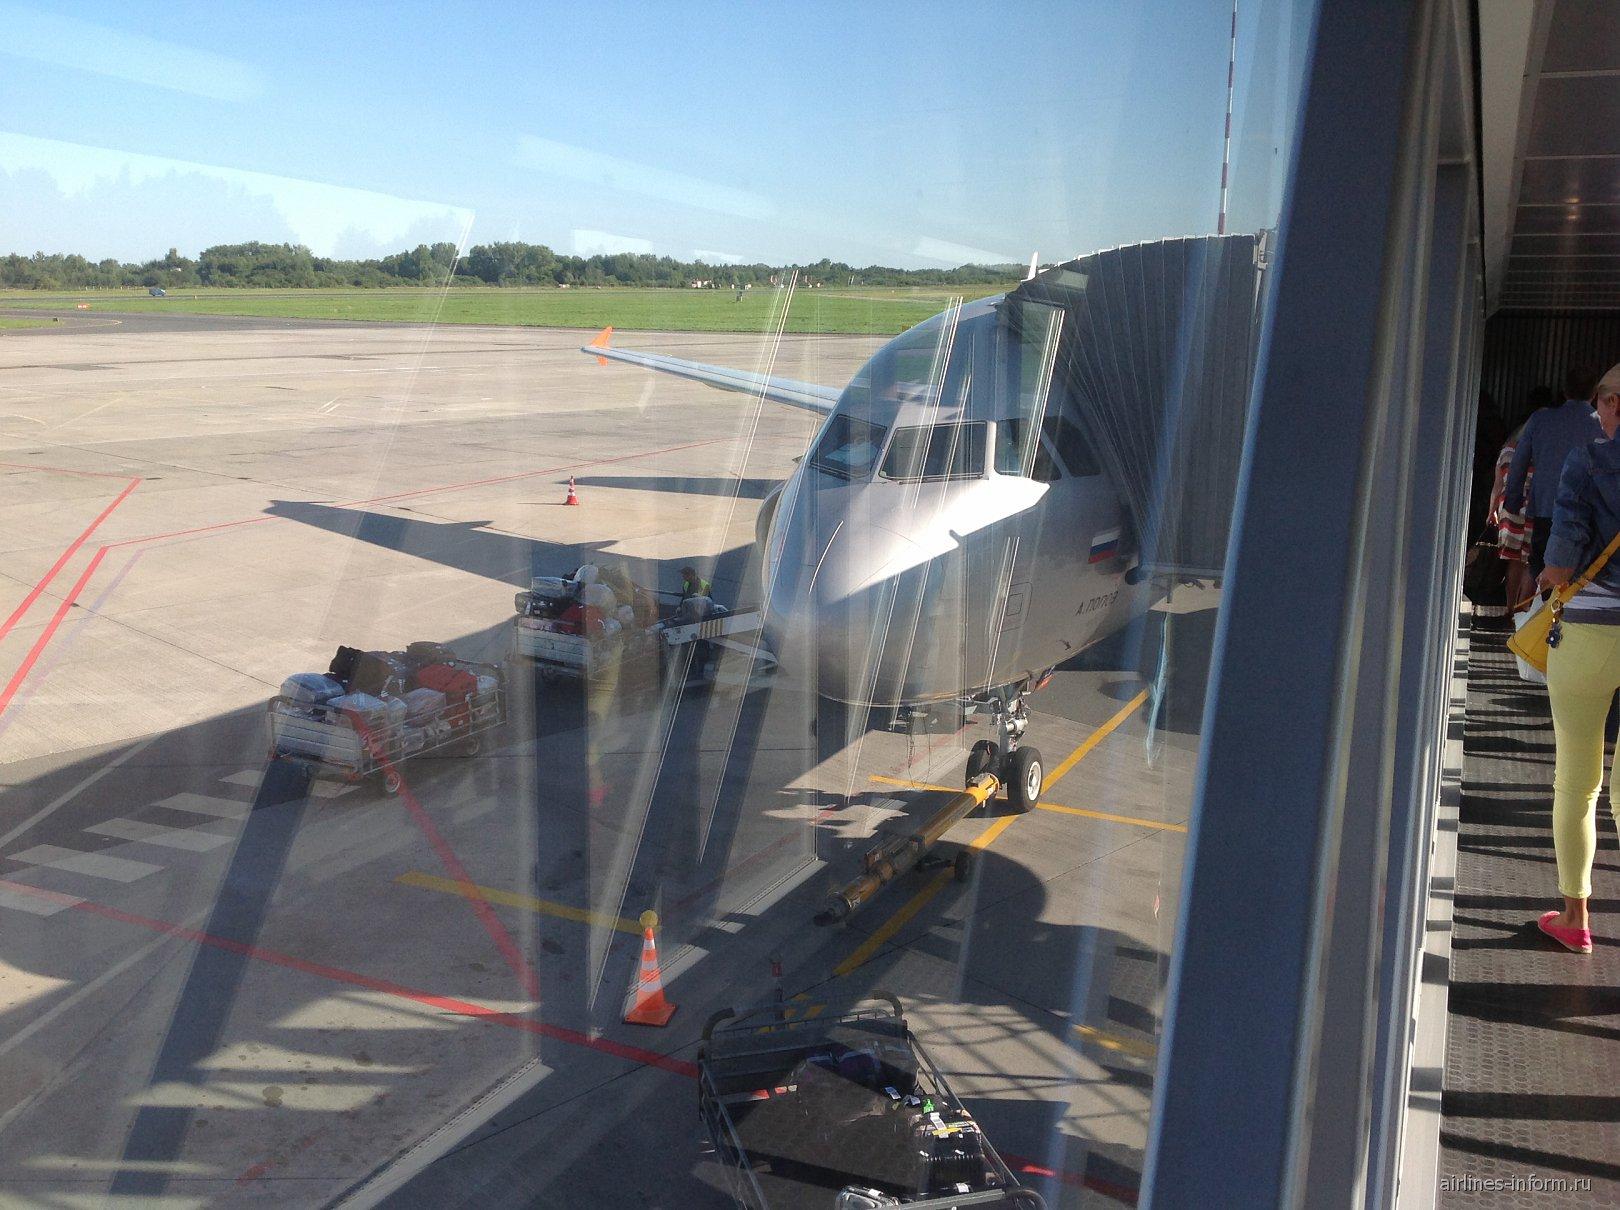 Airbus A320 Аэрофлота в аэропорту Храброво